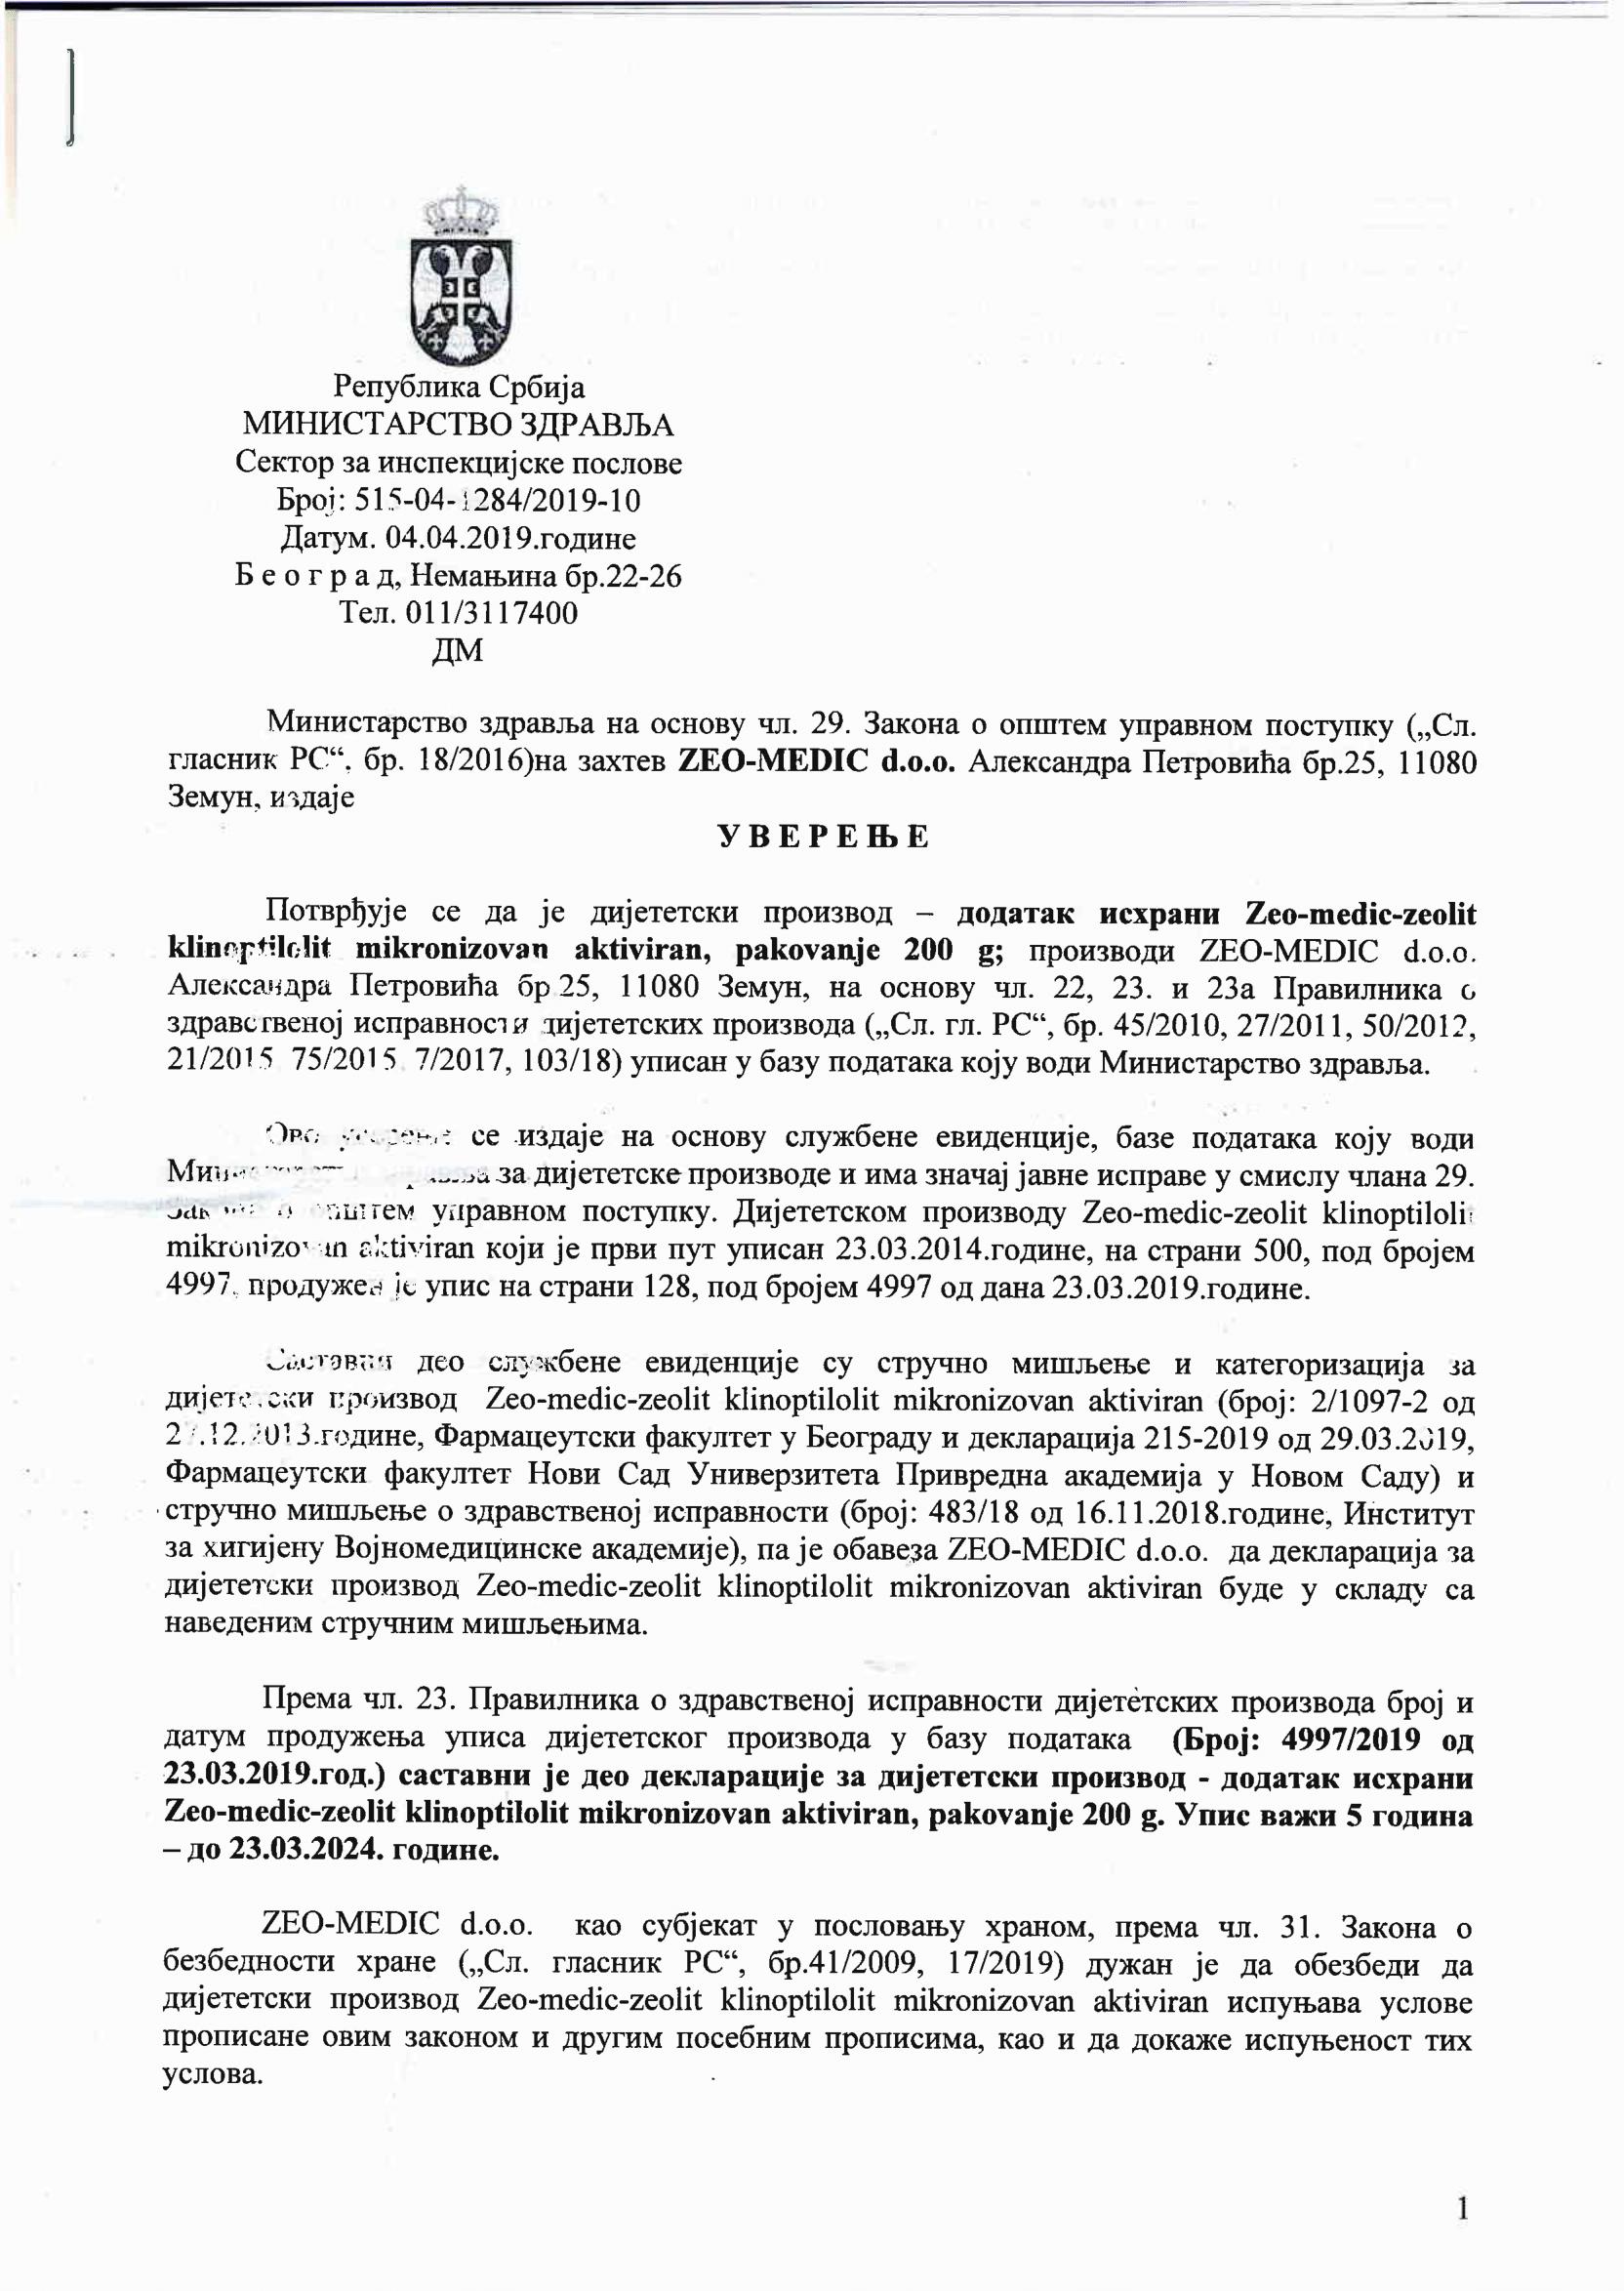 Uverenje o registraciji Zeolit klinoptilolit mikronizovan aktiviran 200g